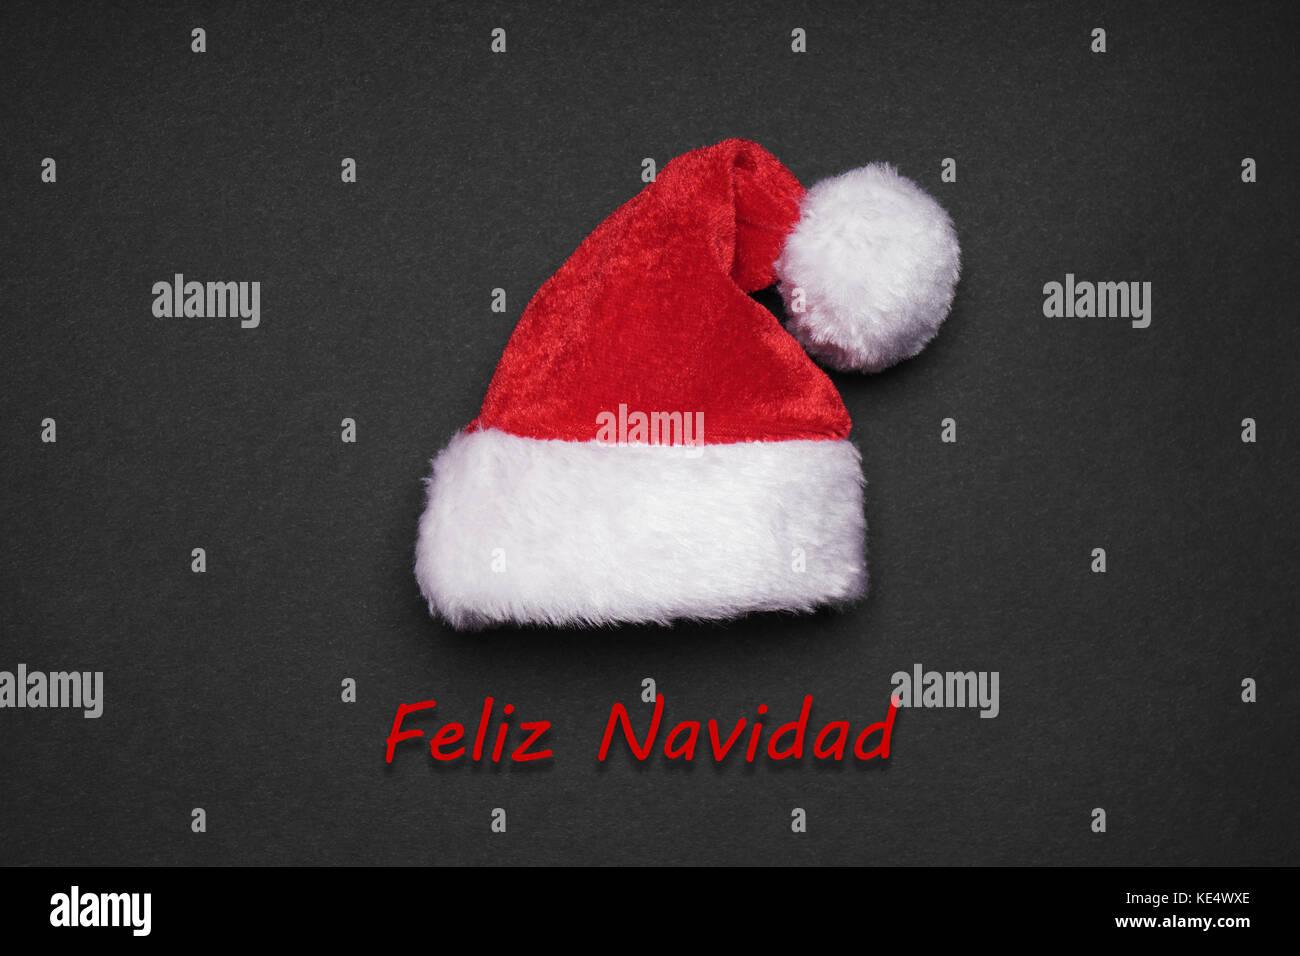 Feliz Navidad spagnolo di natale della scheda Messaggi di saluto Foto Stock